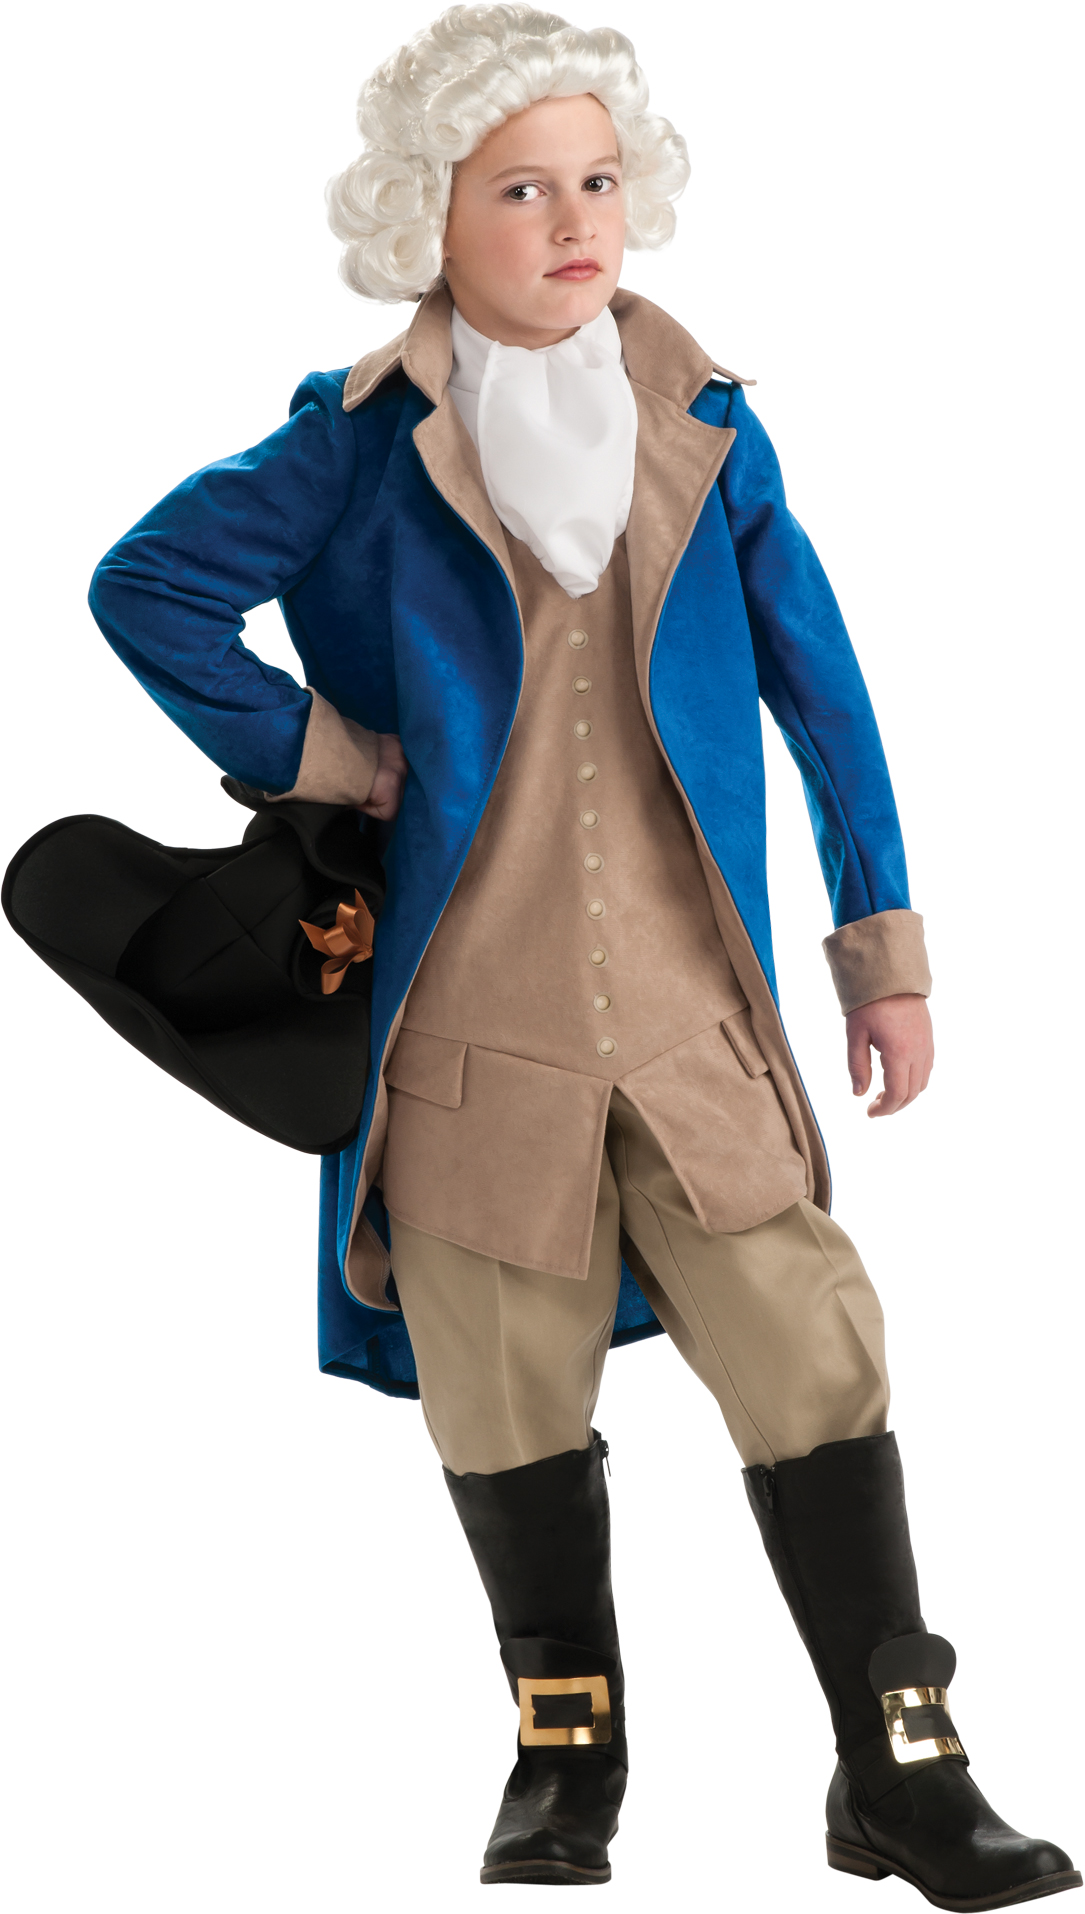 George Washington Child Costume | BuyCostumes.com